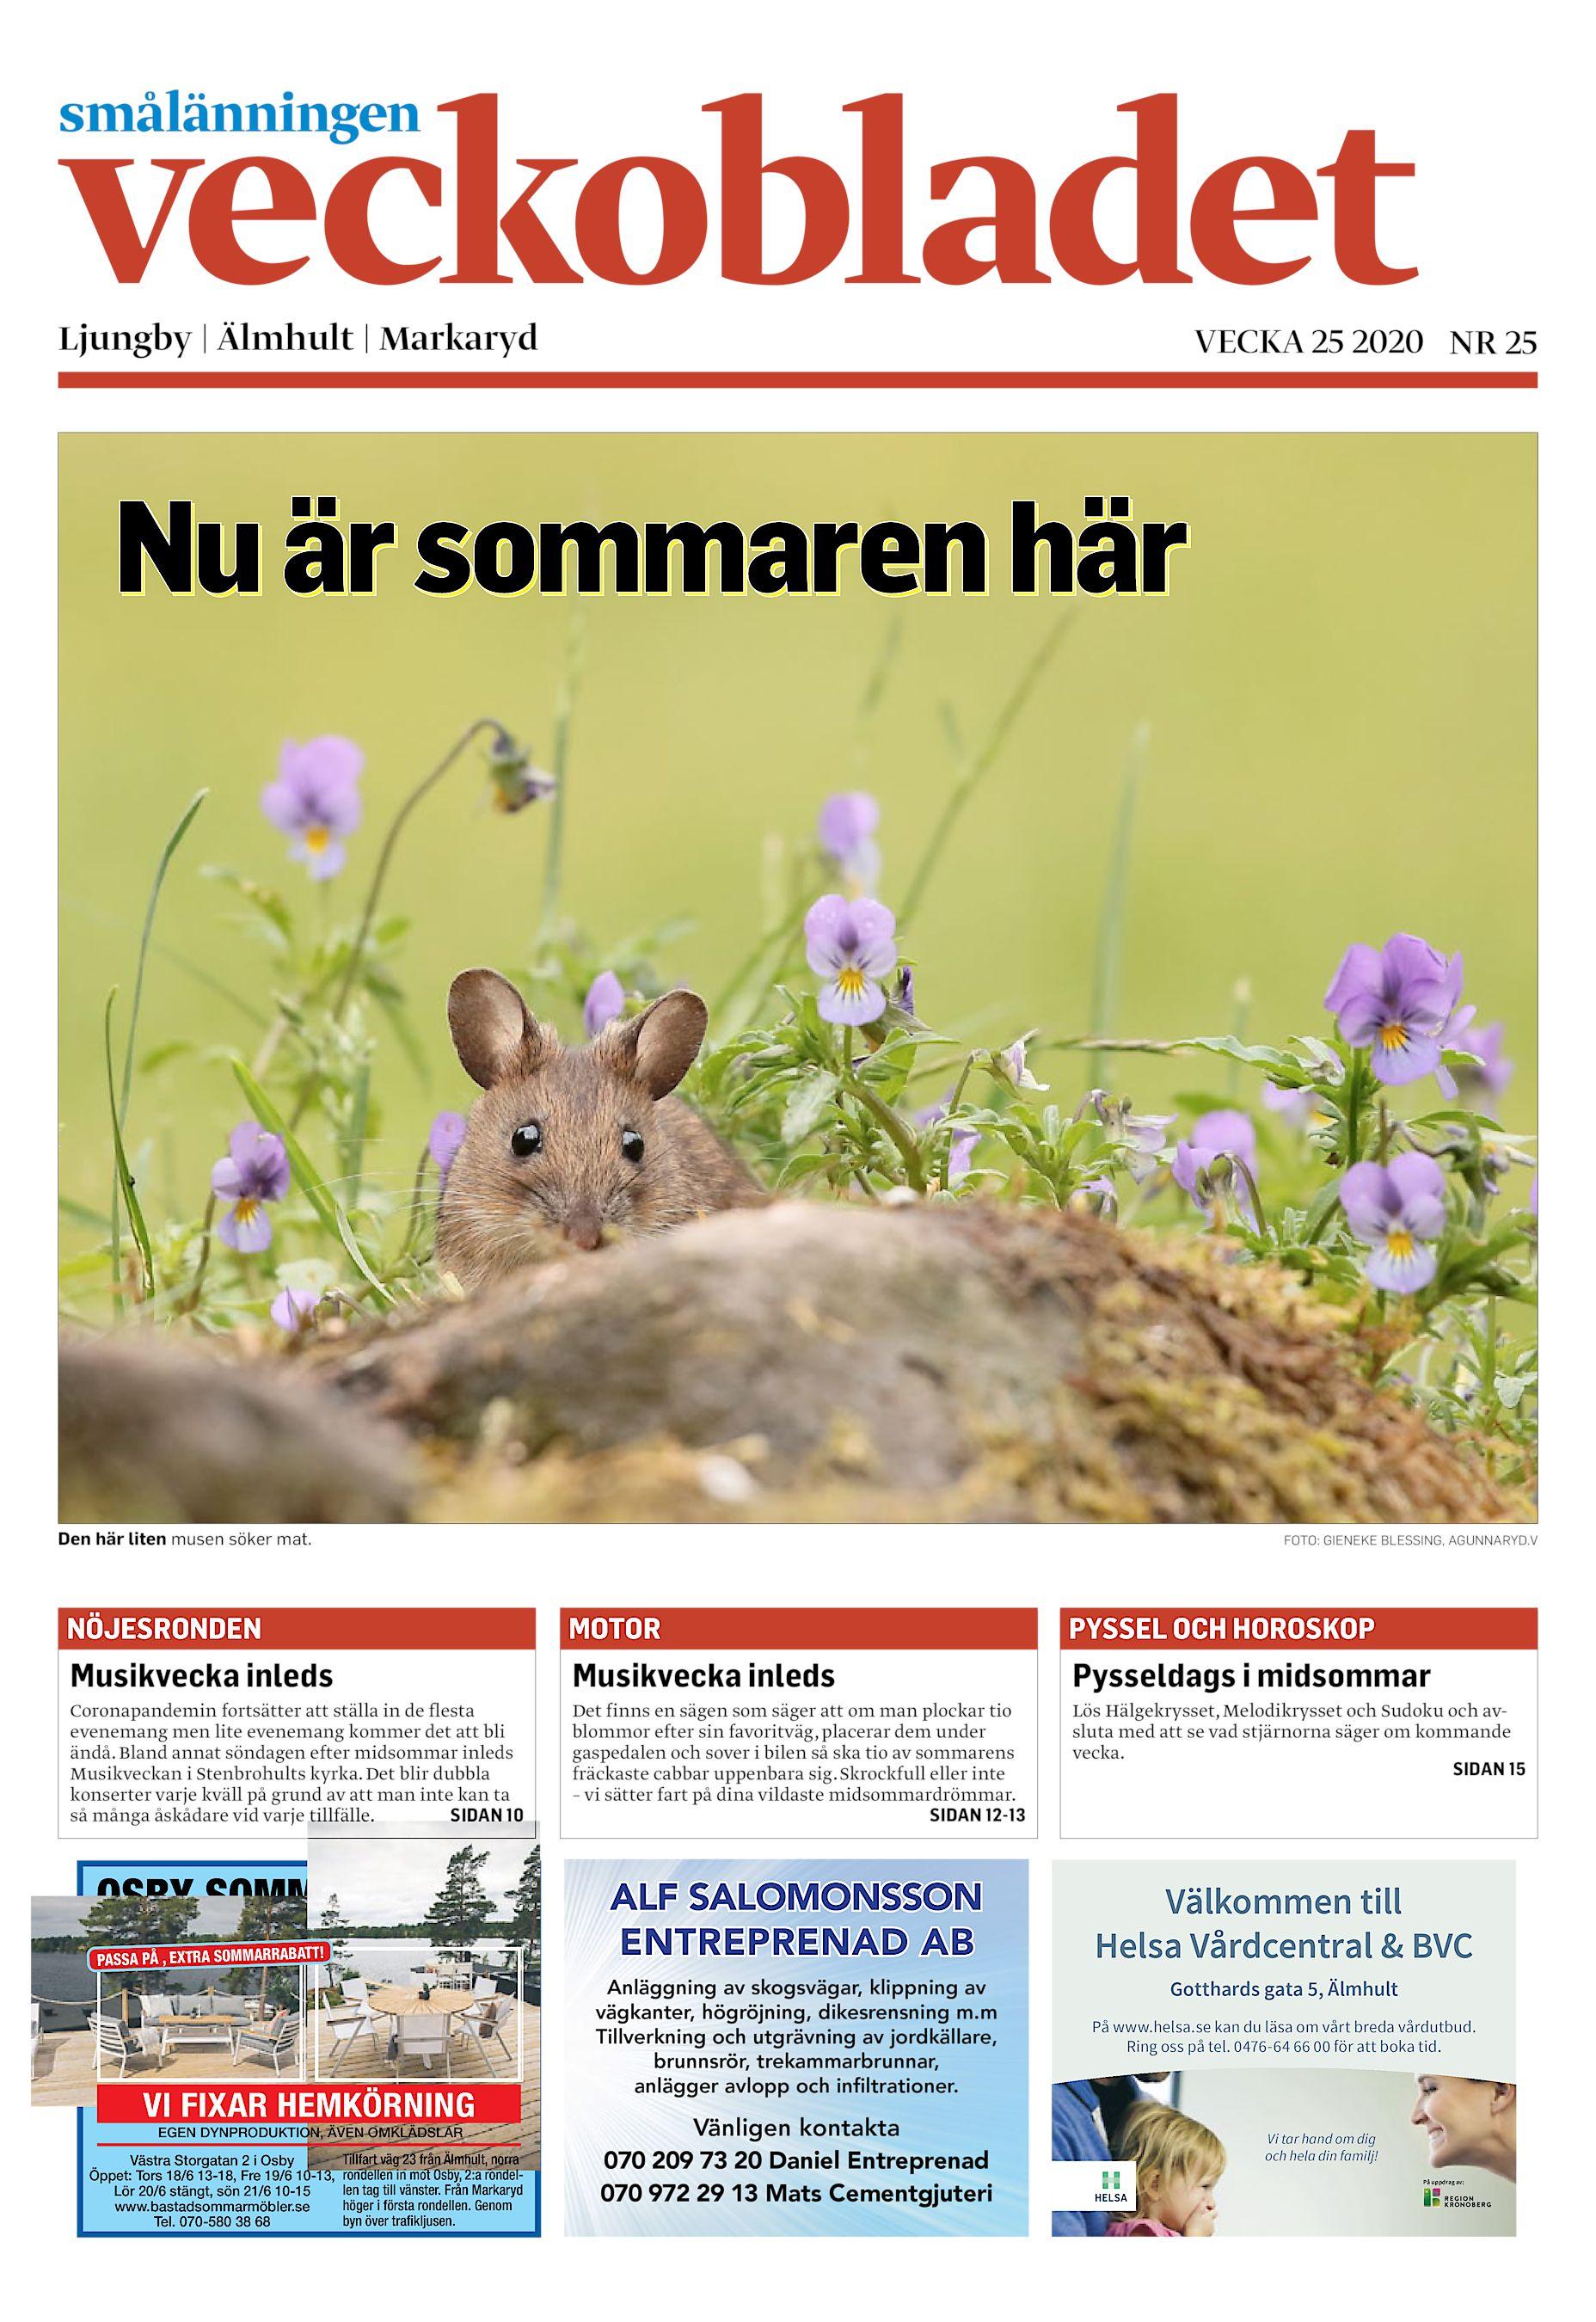 Agneta Ohmes, Stenbrohult 43, Di | satisfaction-survey.net